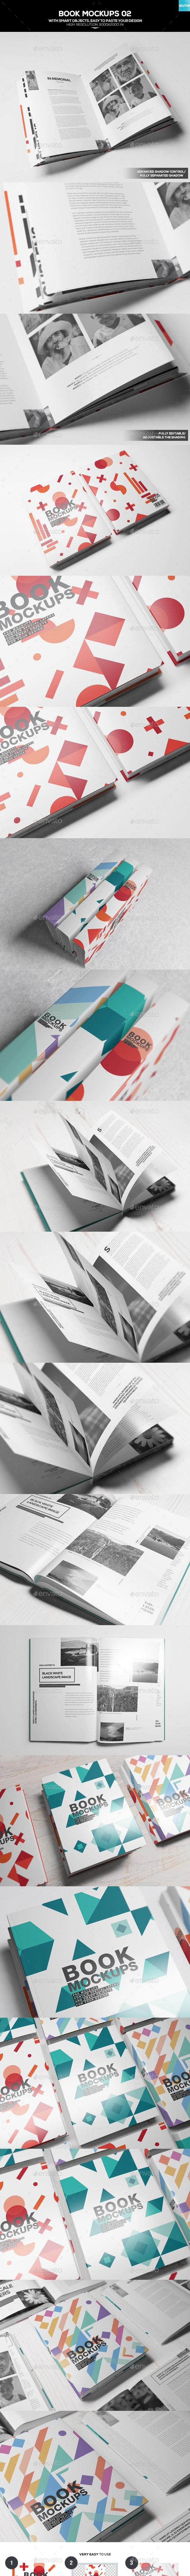 Book Mockups 02 - Books Print